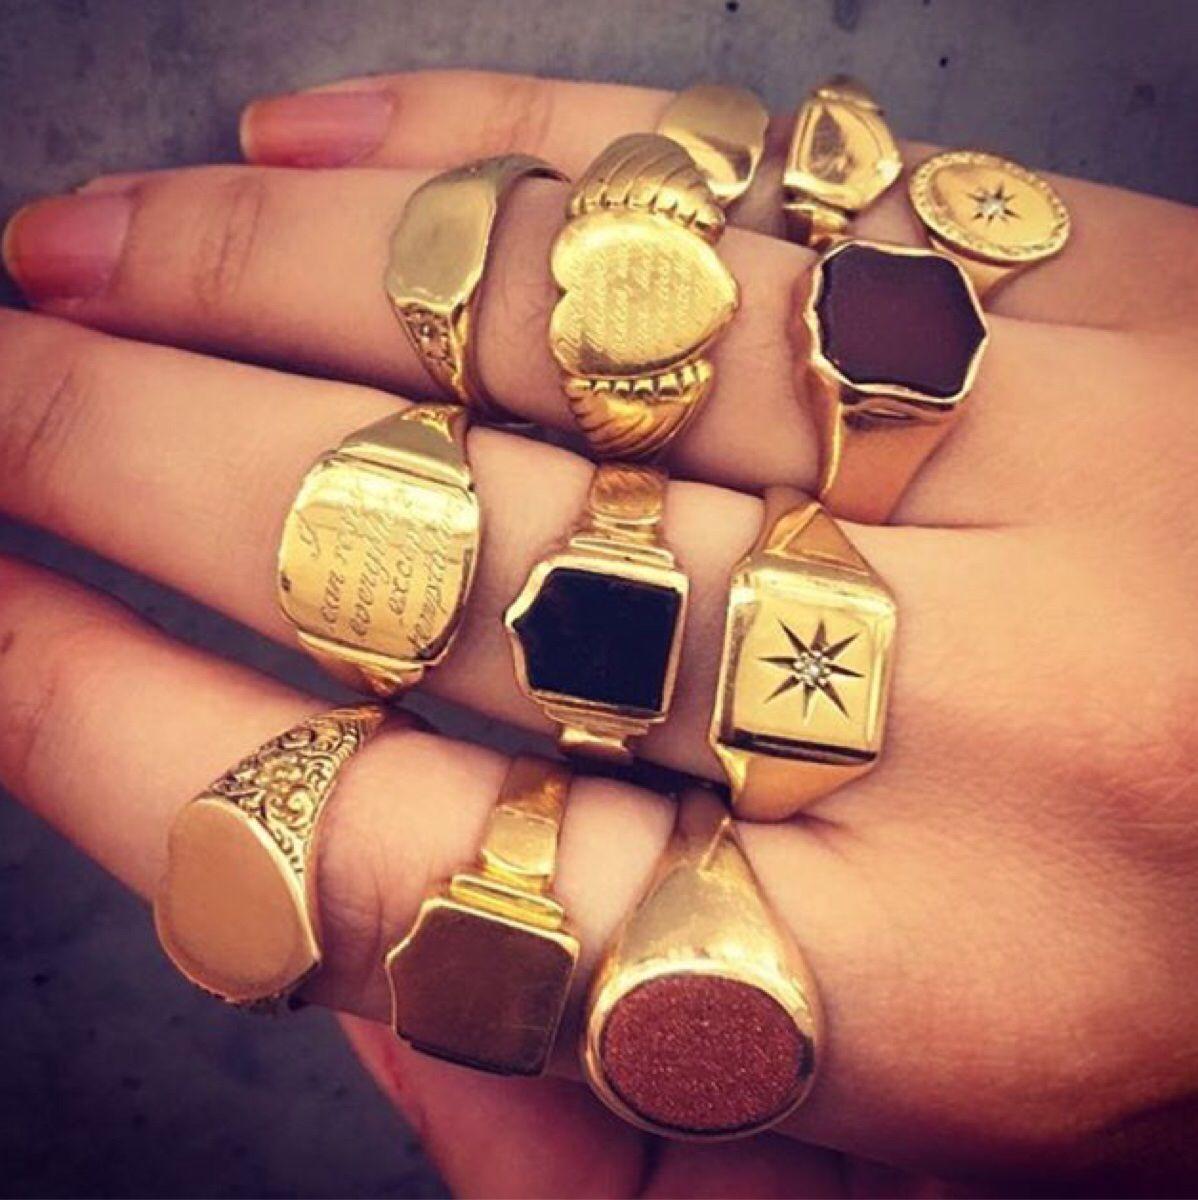 77b51e6f17632 Annina Vogel via Instagram   Jewellry   Antique jewelry, Jewels ...